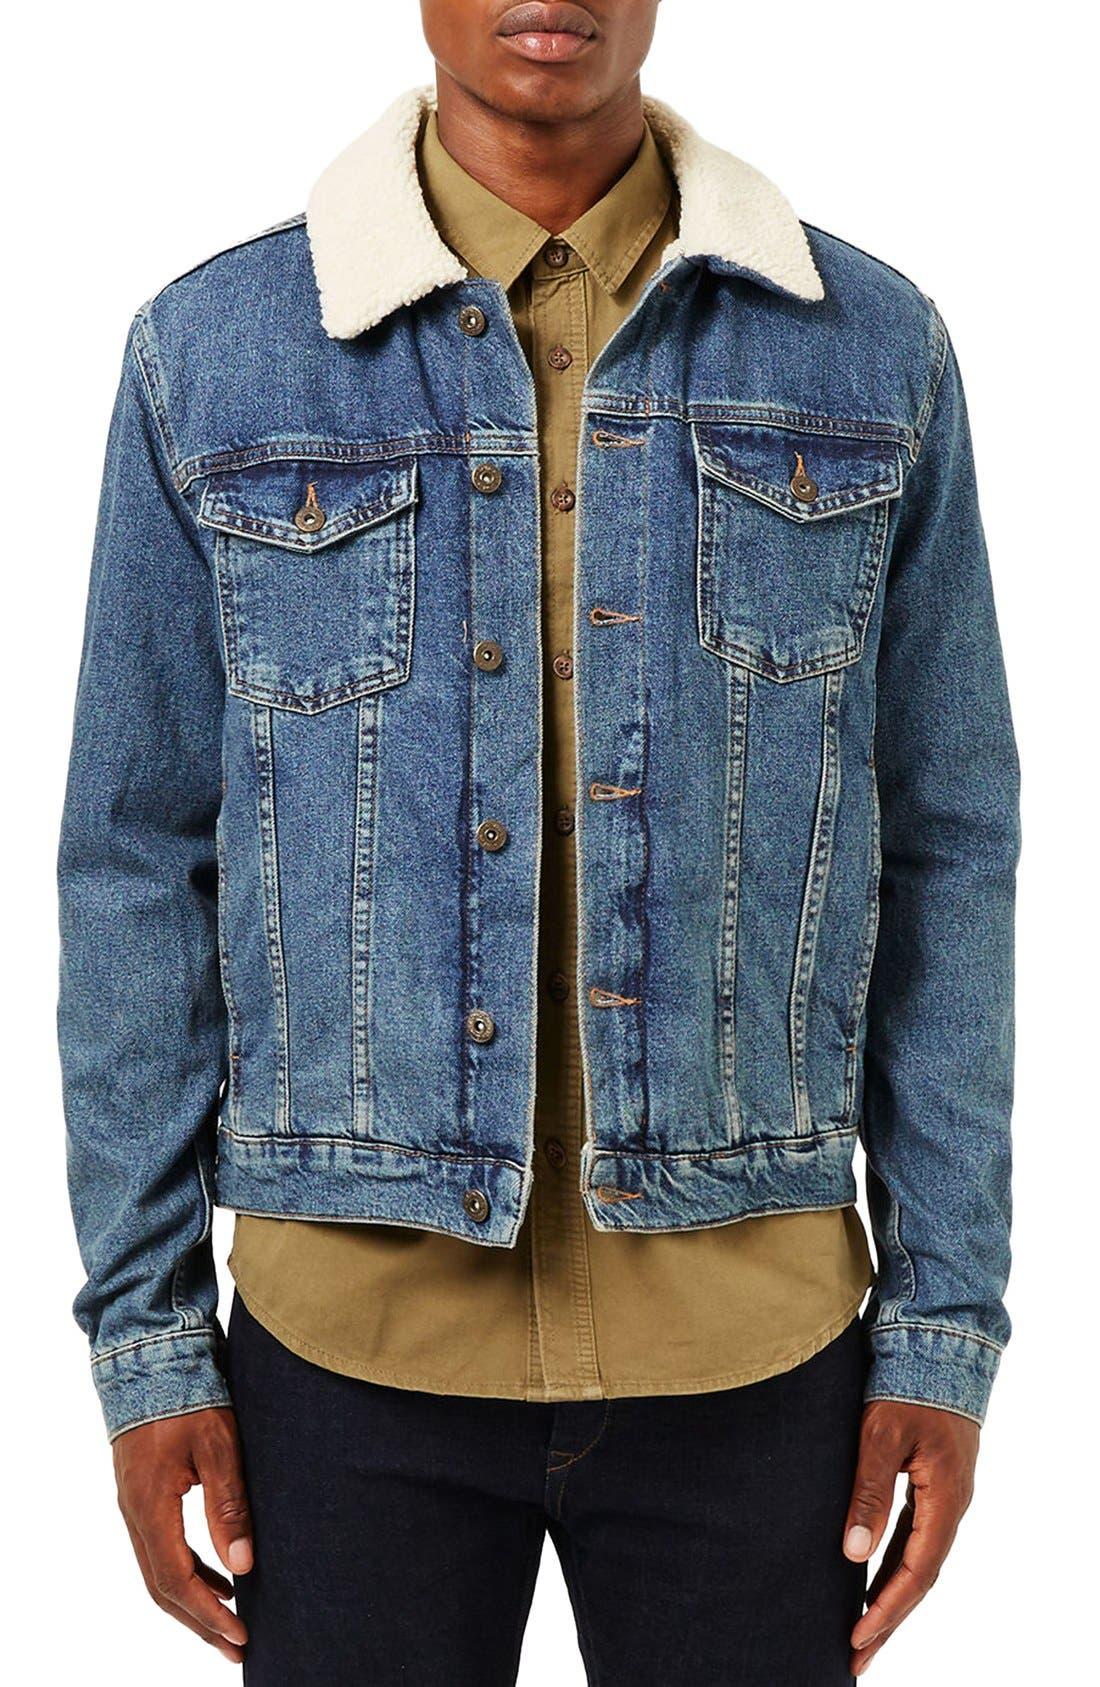 Borg Denim Jacket,                             Main thumbnail 1, color,                             400